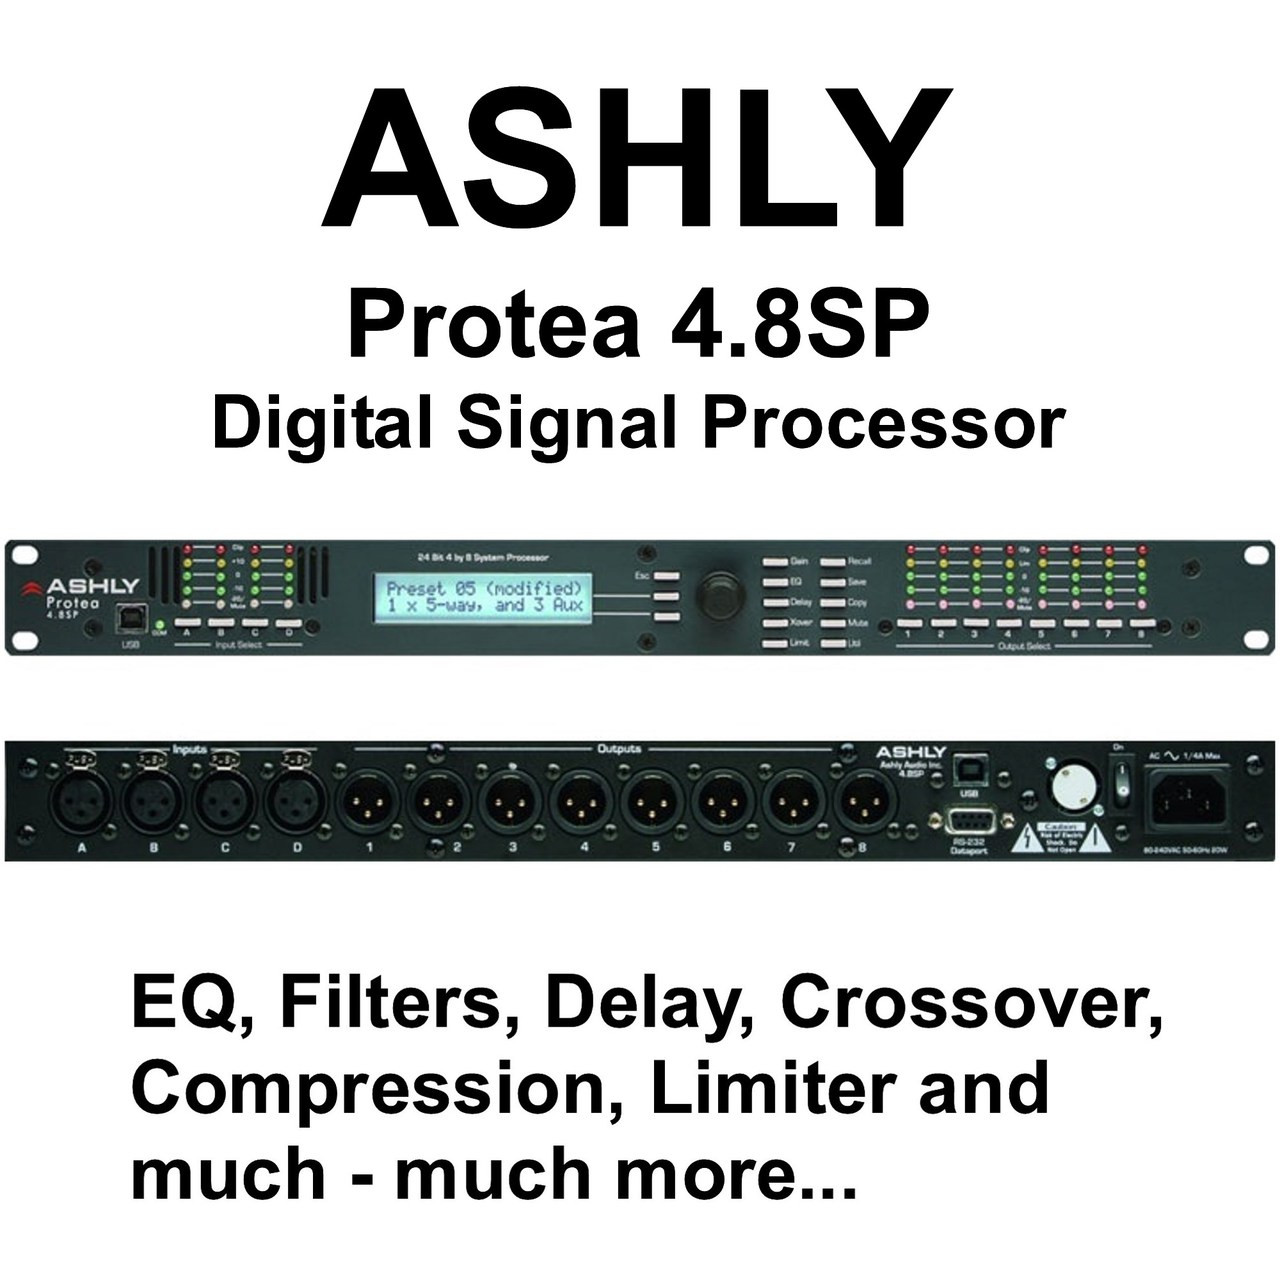 ASHLY PROTEA 4 8SP Professional Multiple Digital Processor $30 Instant  Coupon Use Promo Code: $30-OFF